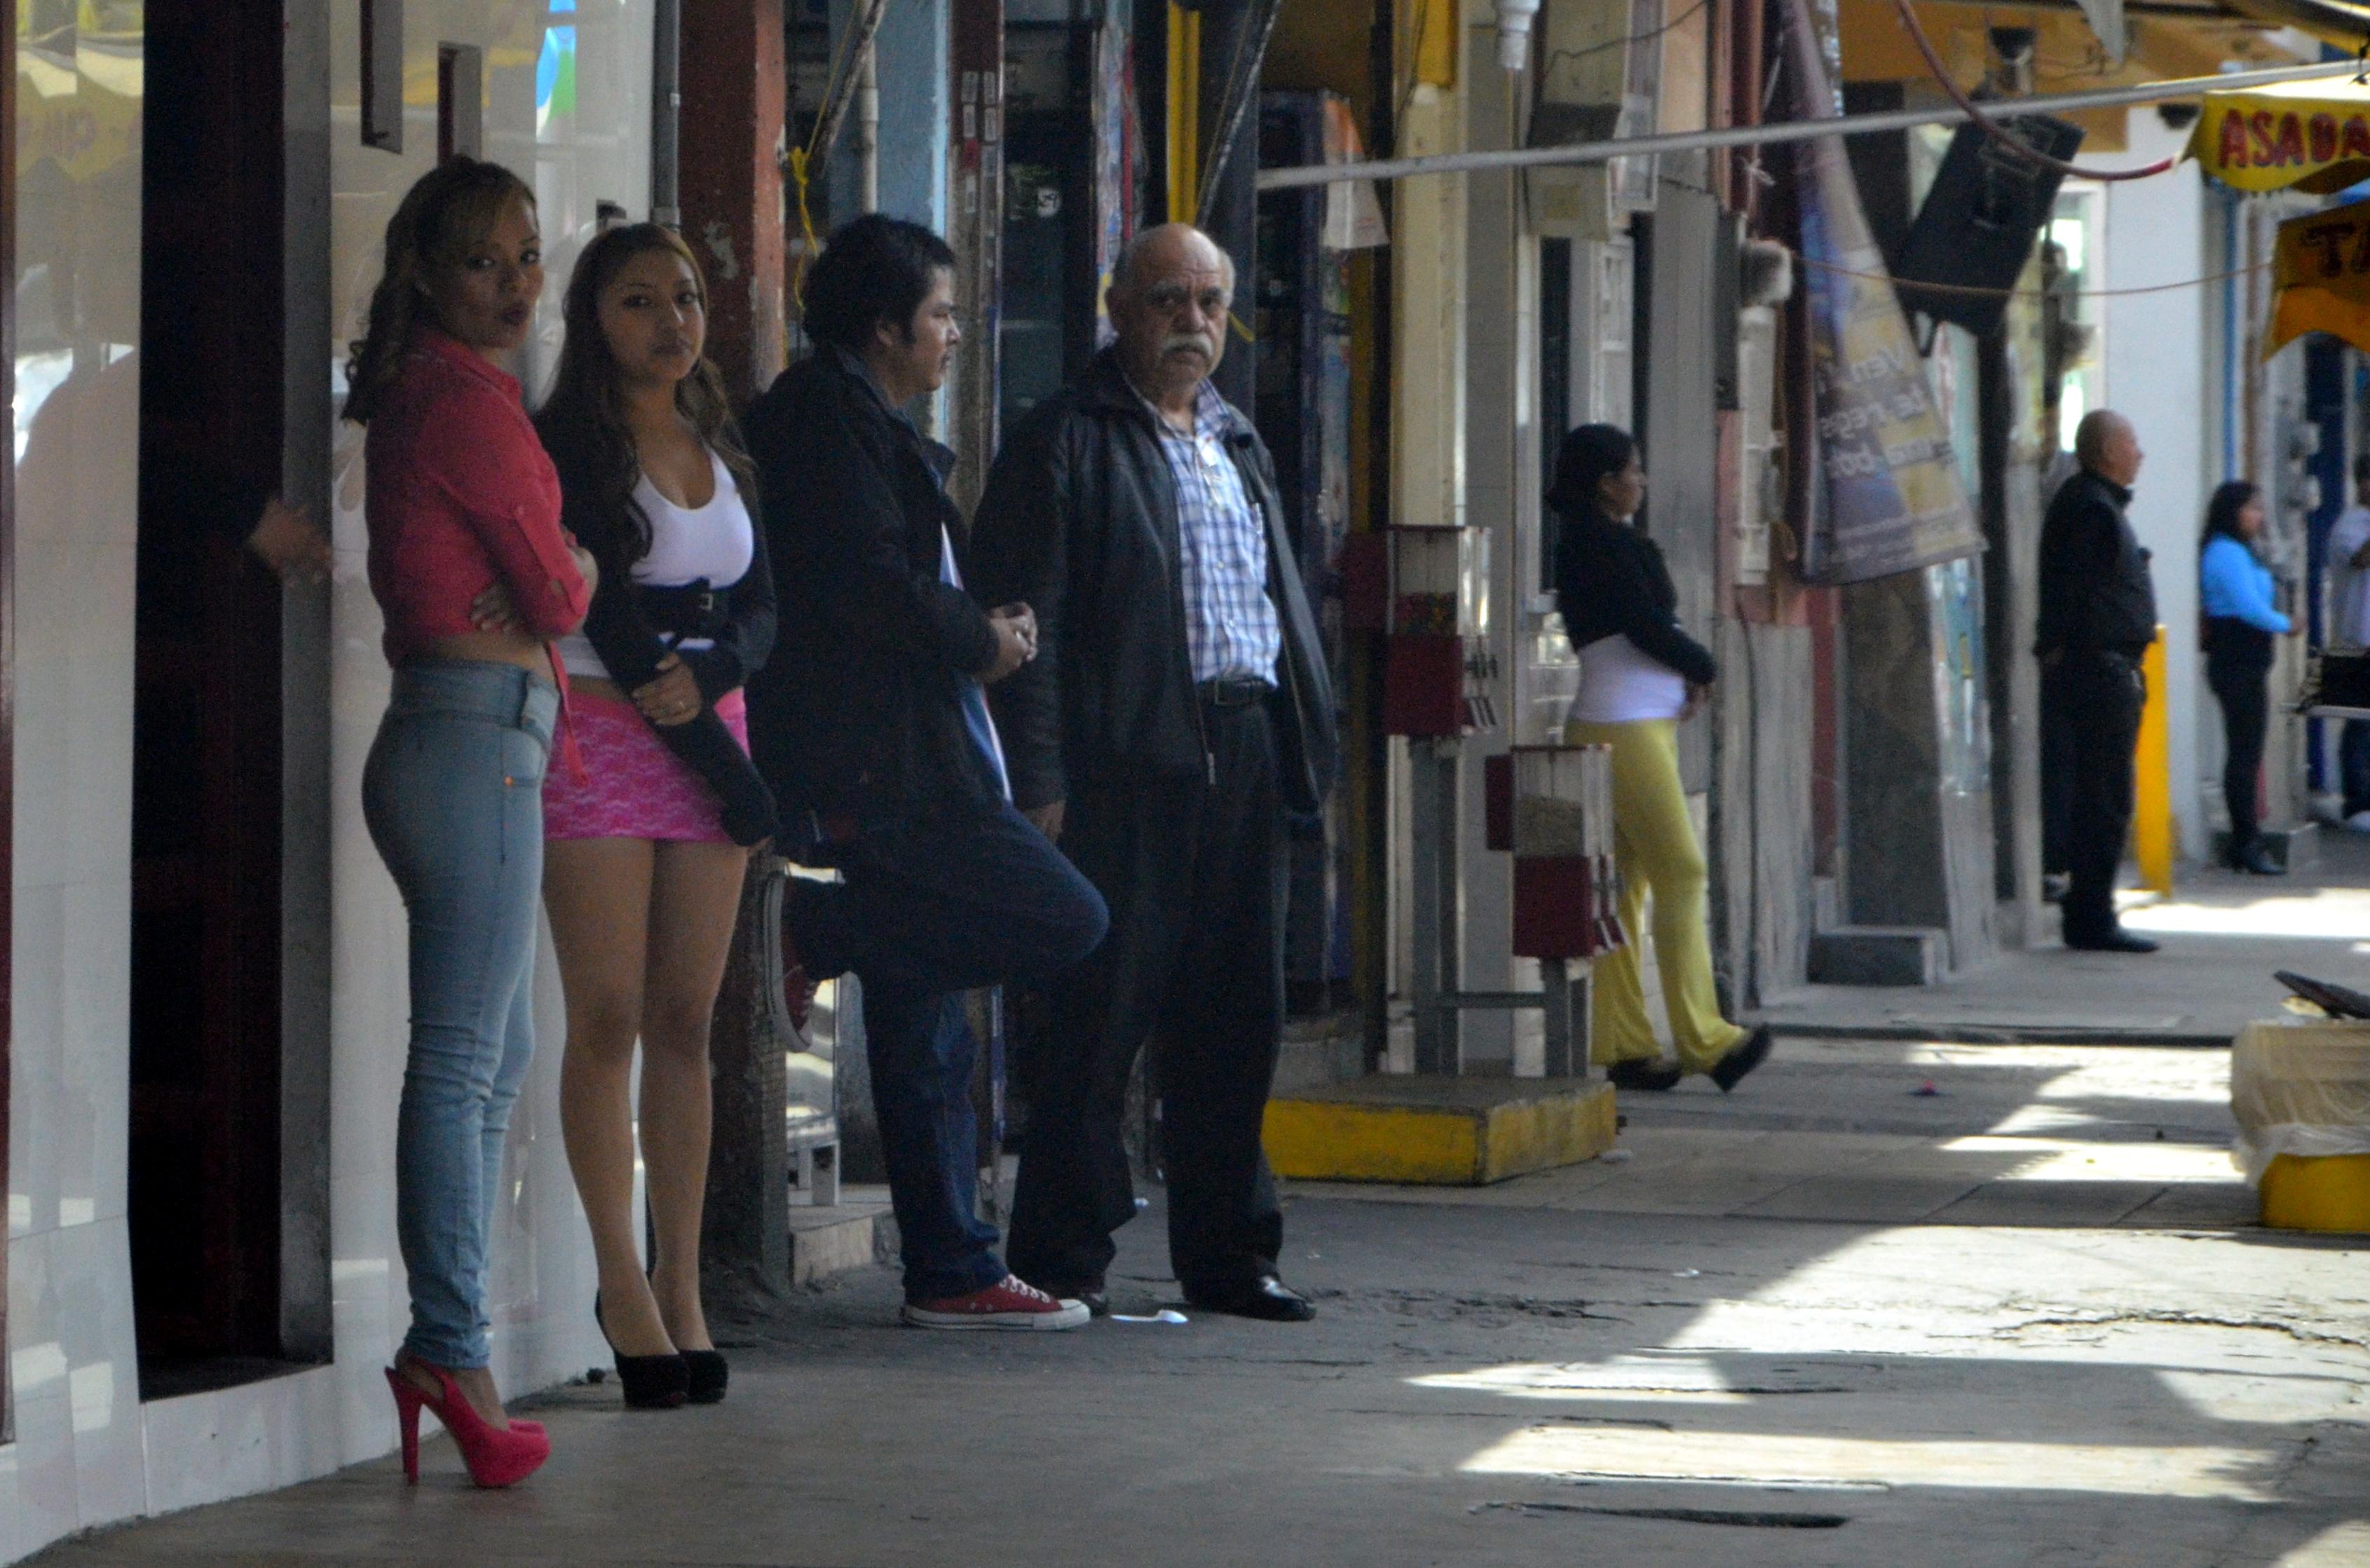 putas por plaza norte escort colegiala